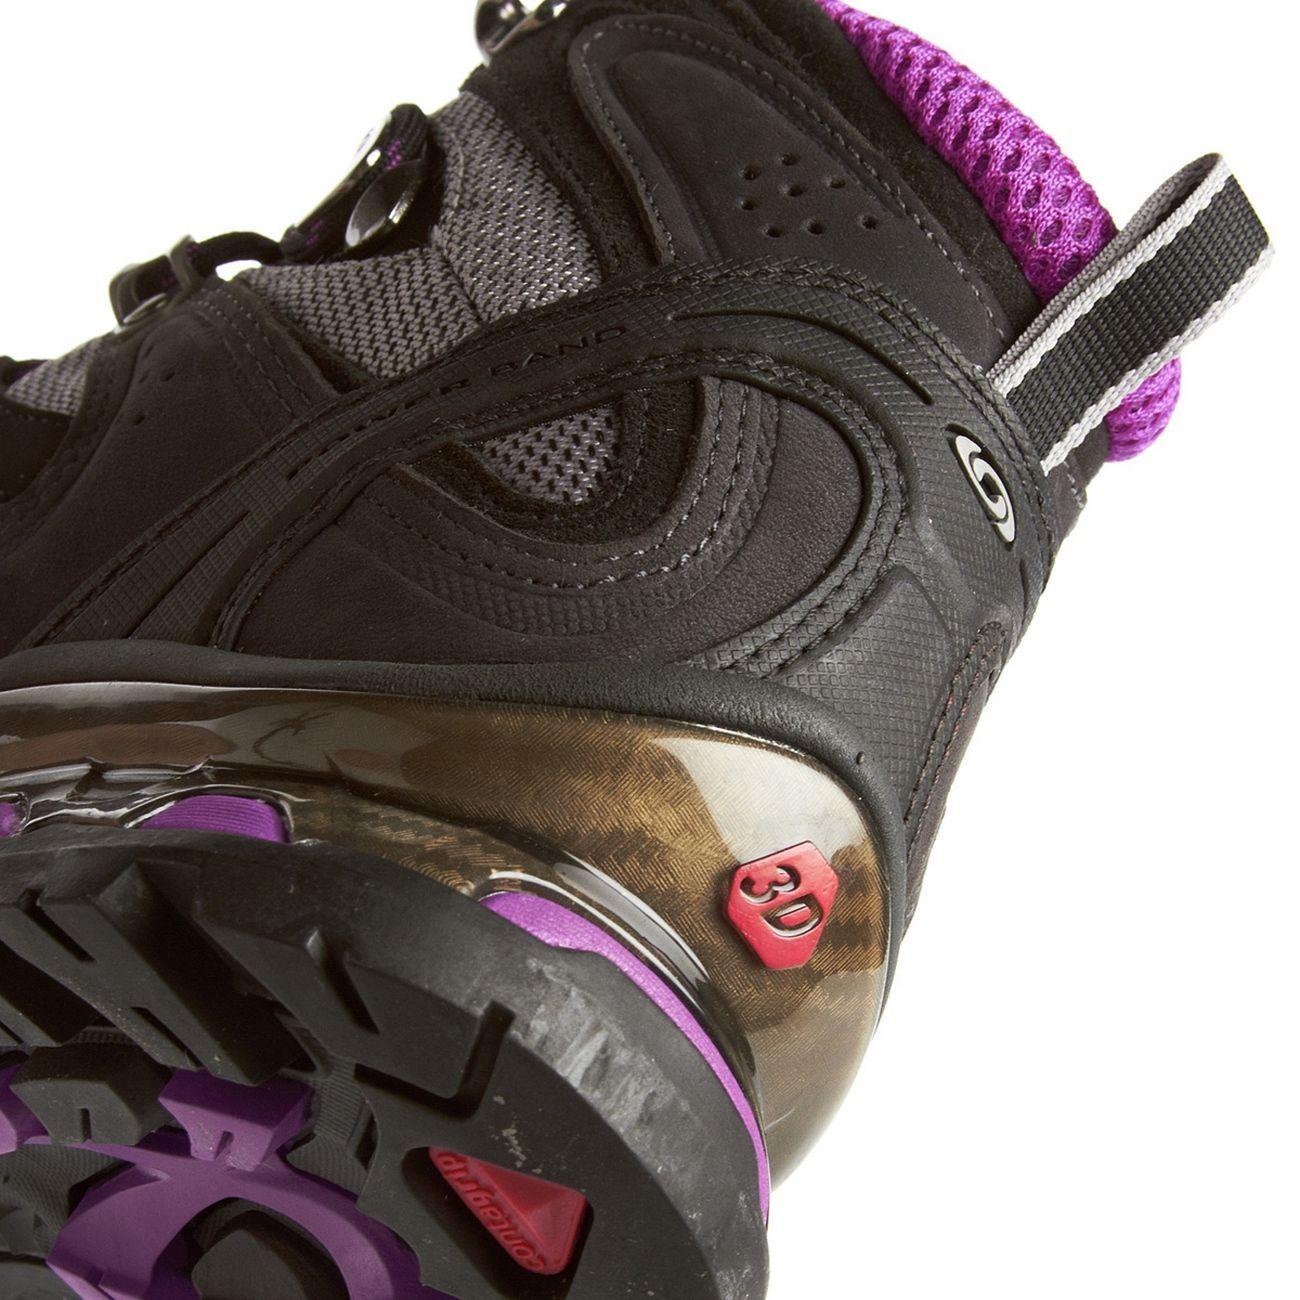 Salomon Women's Comet 3D Lady GTX Hiking Boot